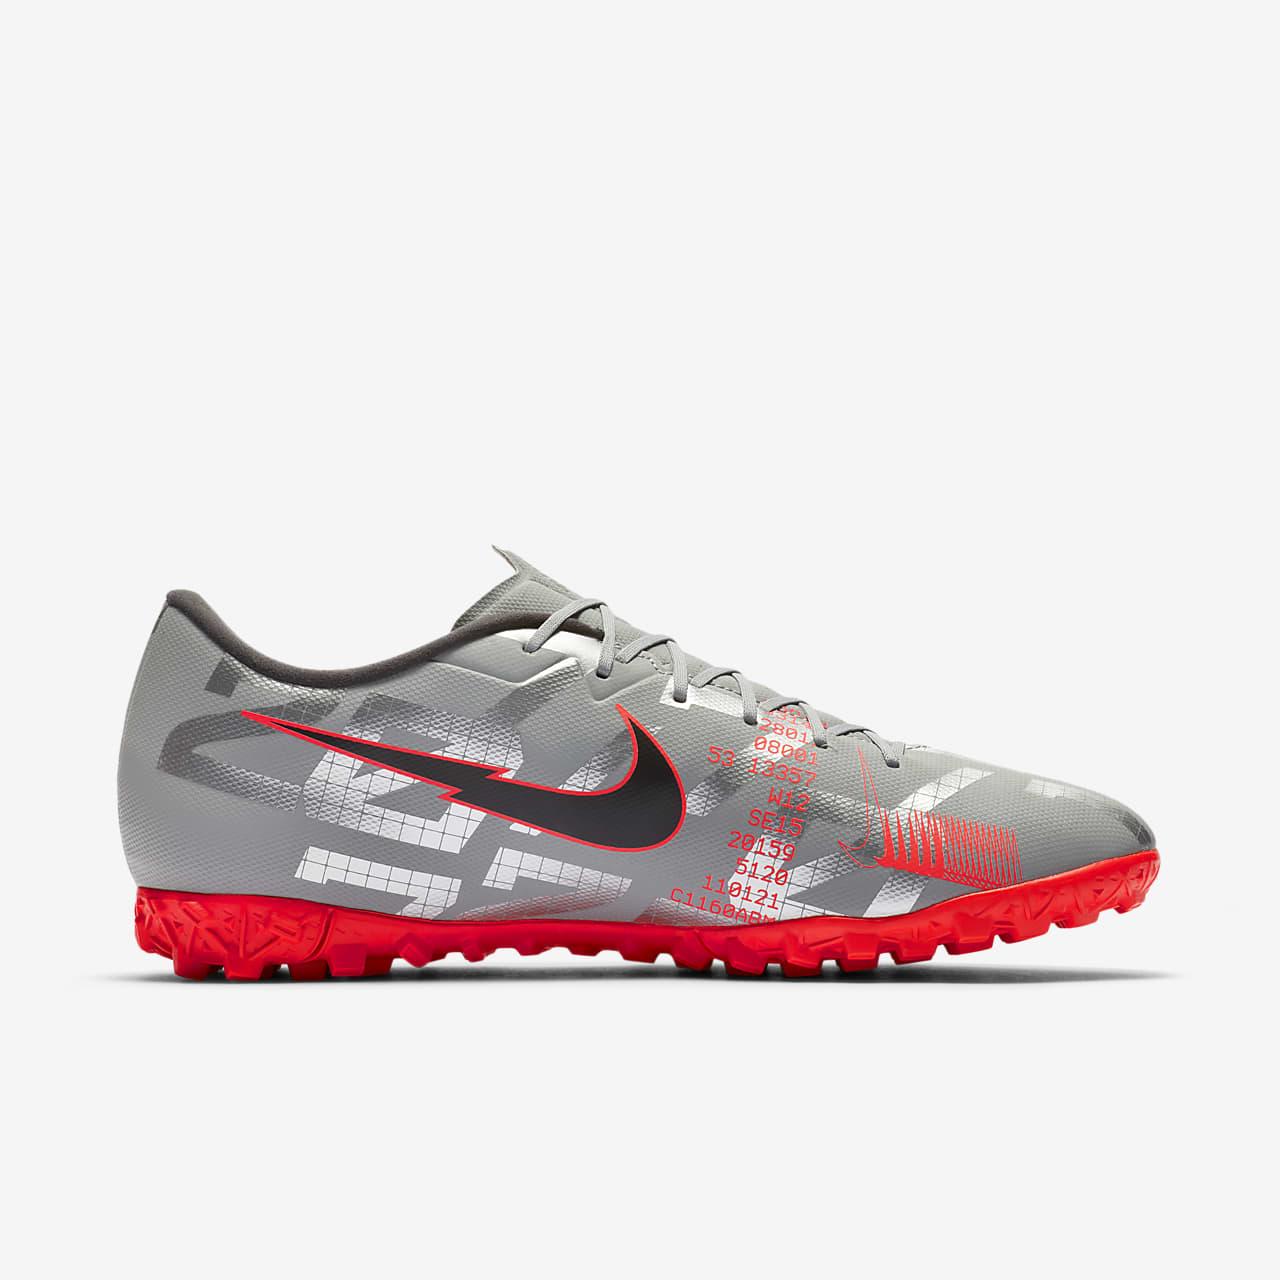 Giày đá bóng Nike Mercurial Vapor 13 Academy TF Neighbourhood